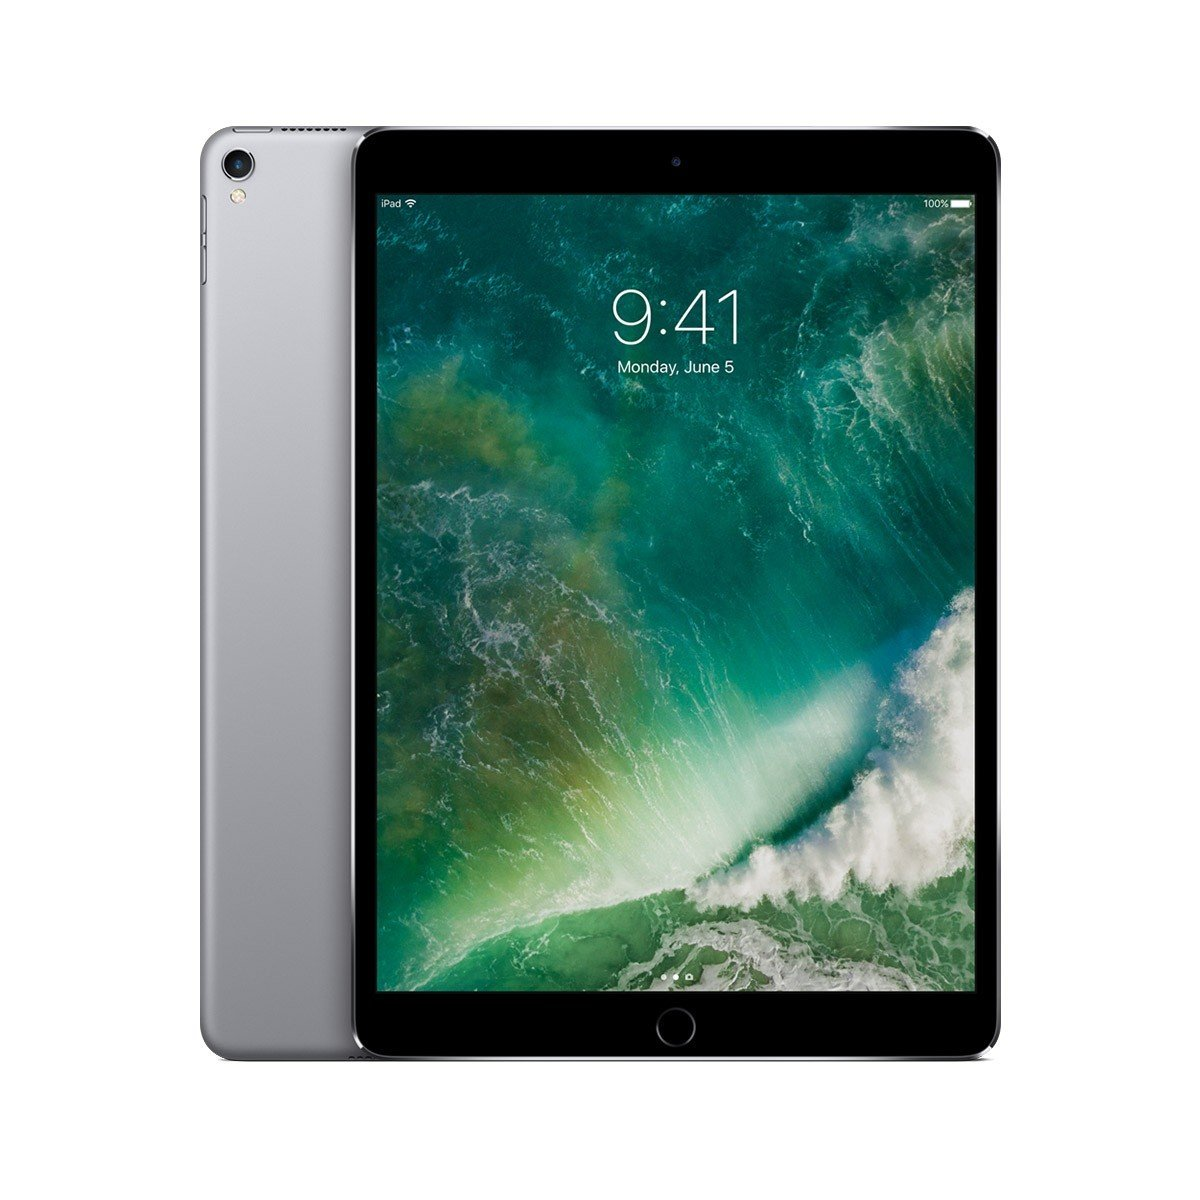 iPad Pro 10.5-inch Space Grey